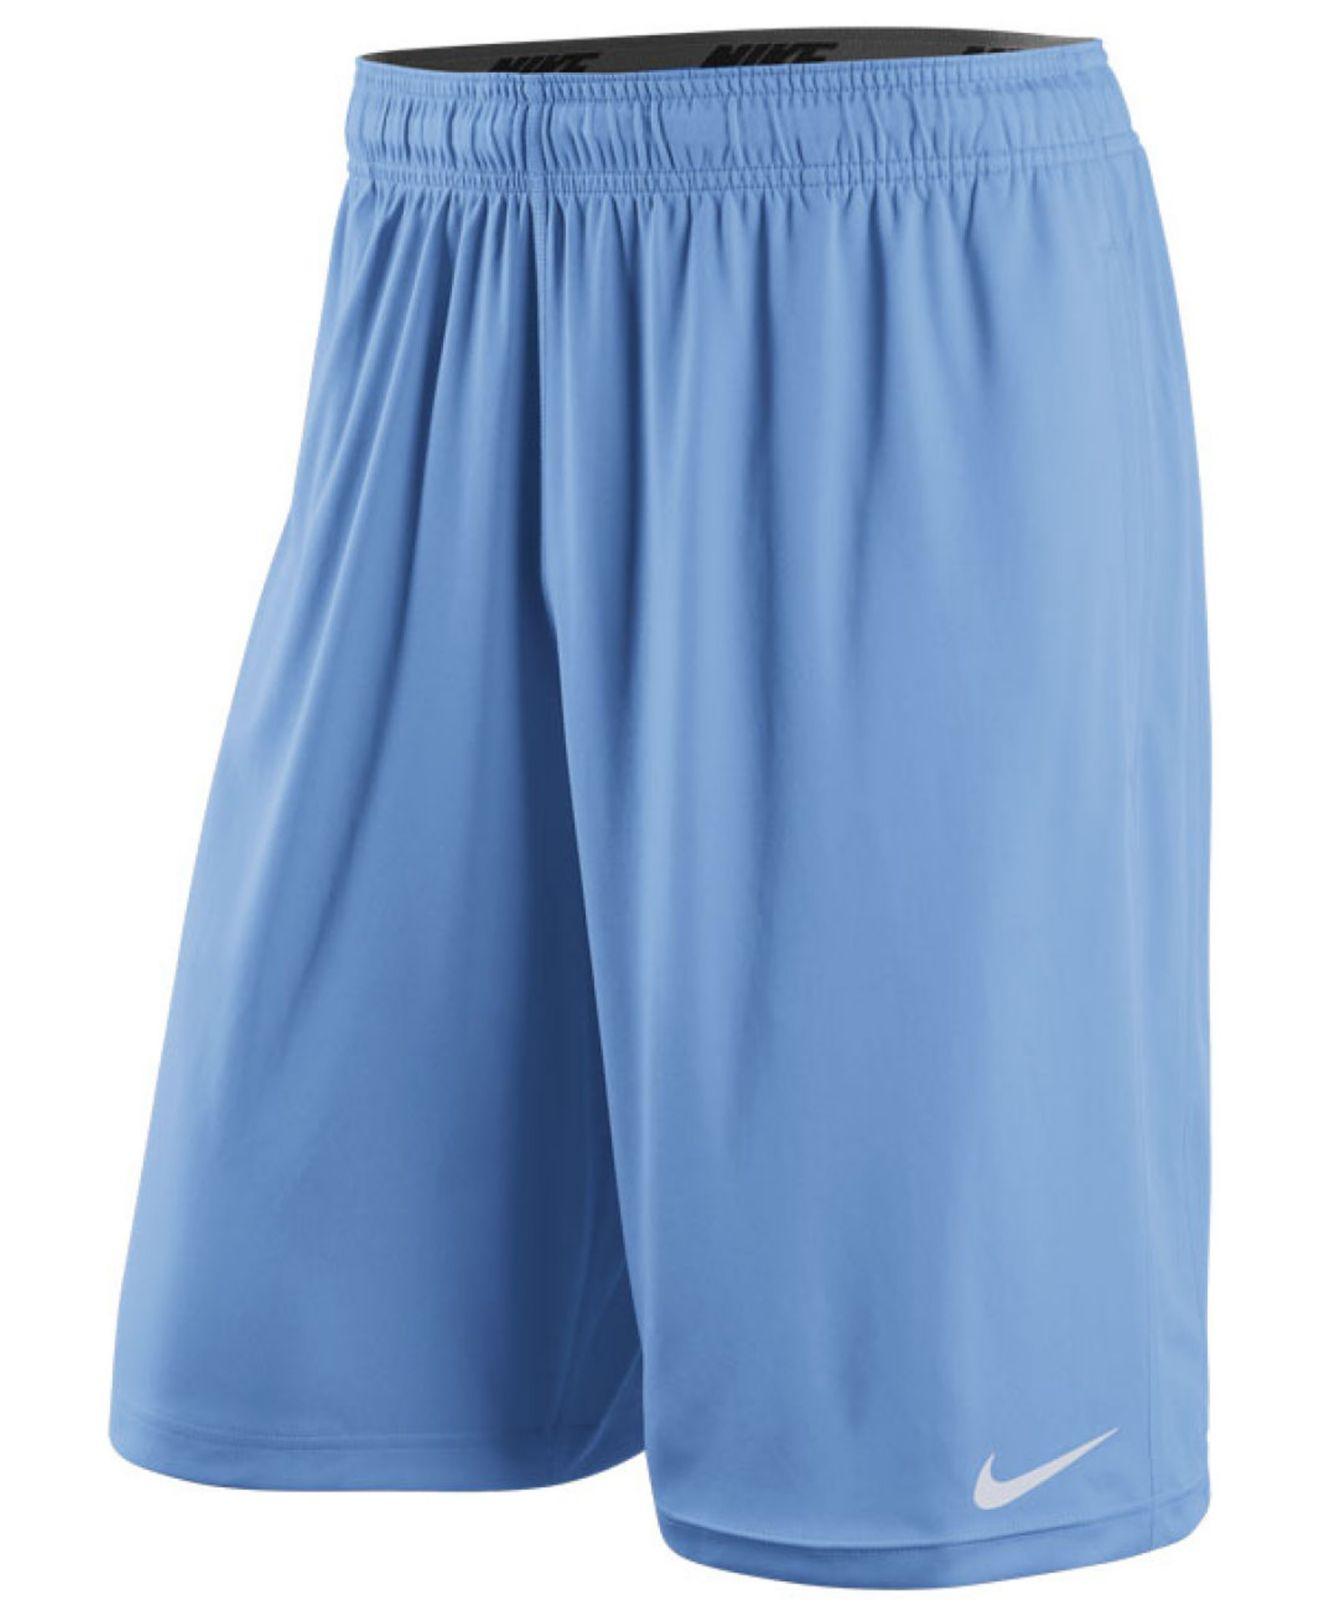 Nike North Carolina Tar Heels Practice Shorts in Blue   Lyst